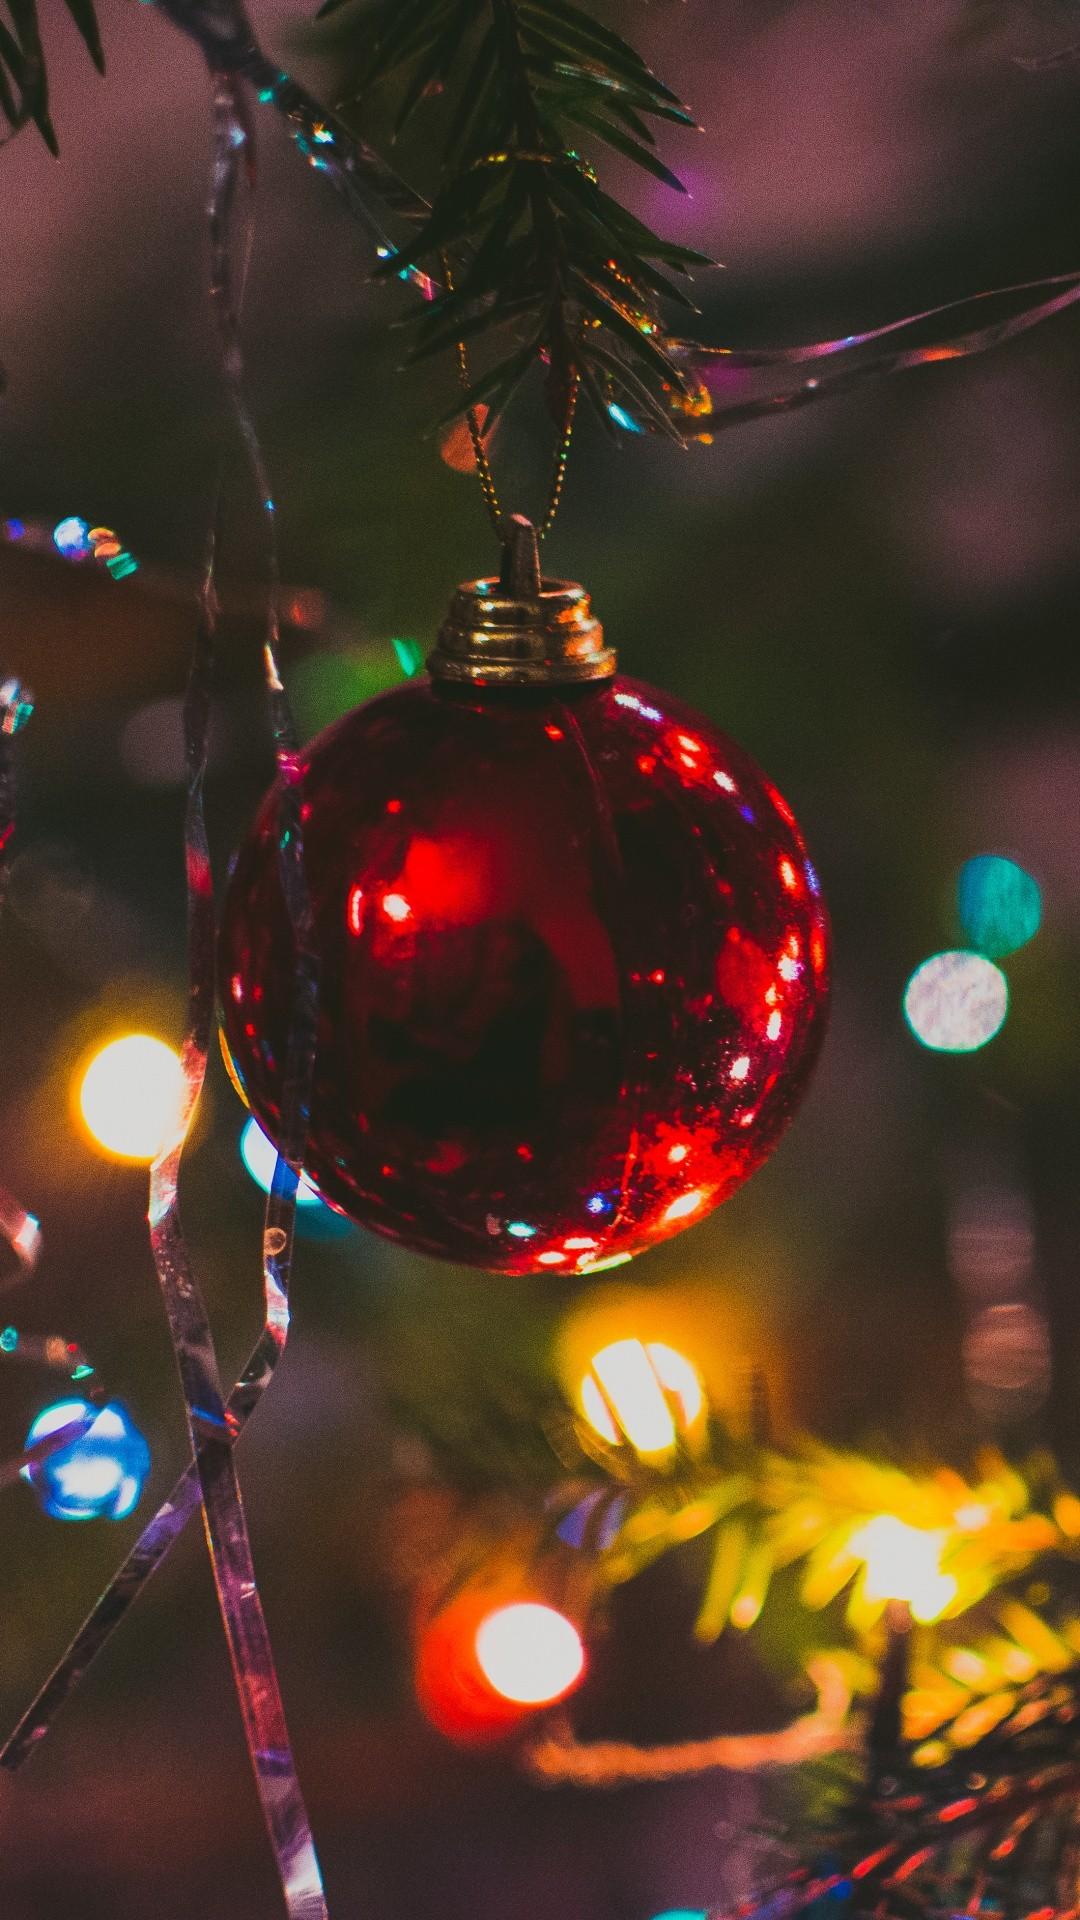 Christmas Lights phone wallpaper